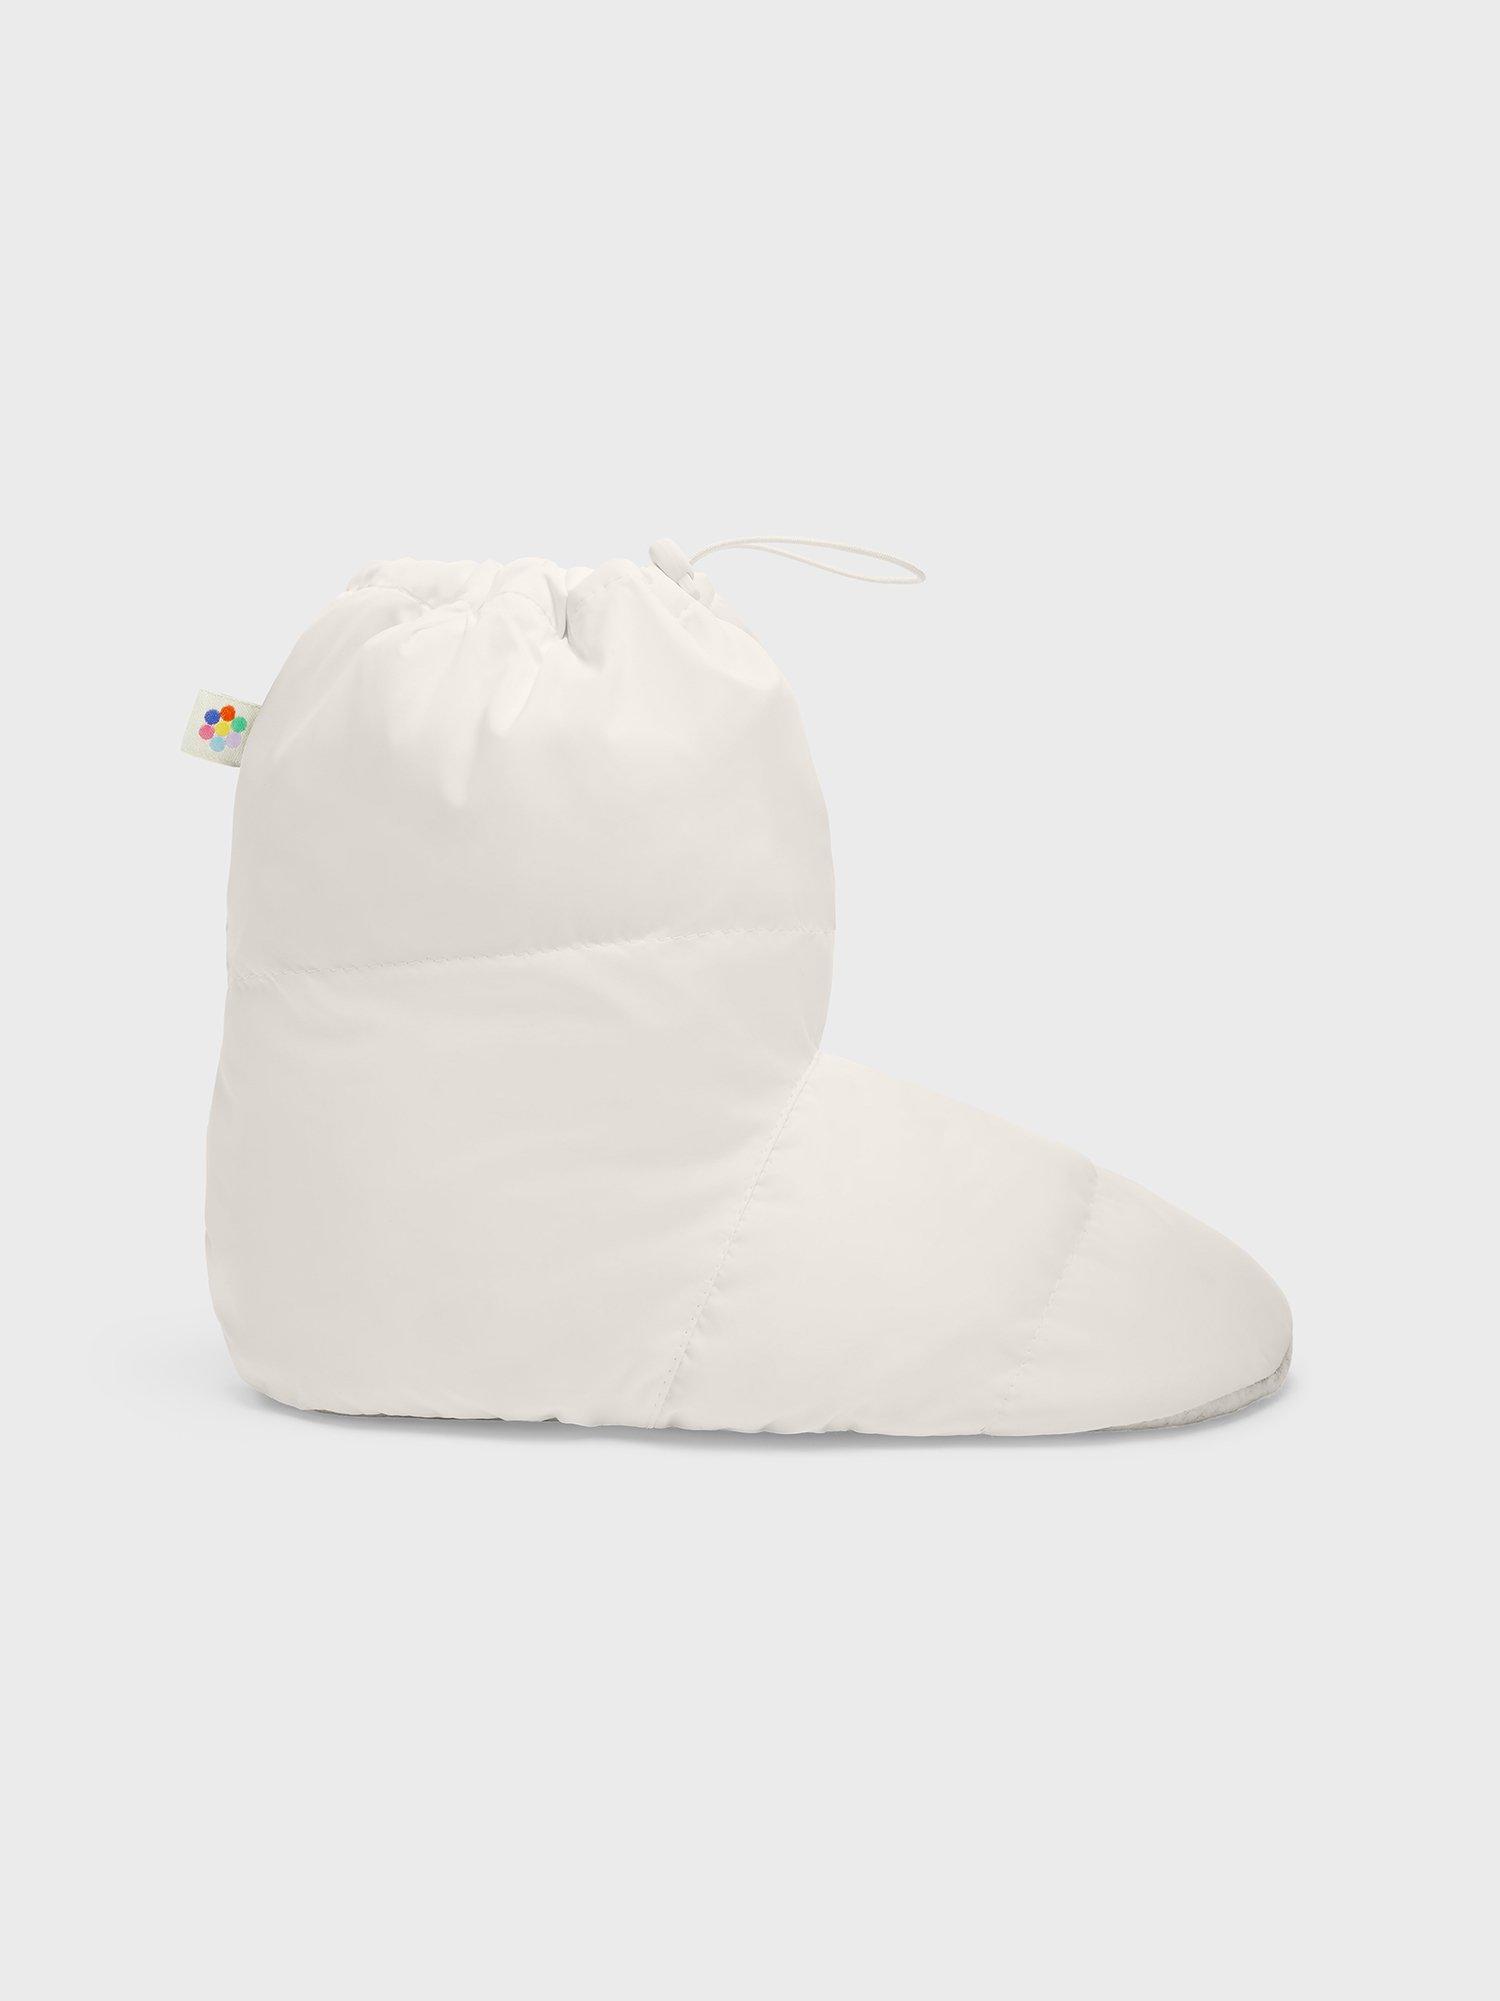 FLWRDWN™ slippers